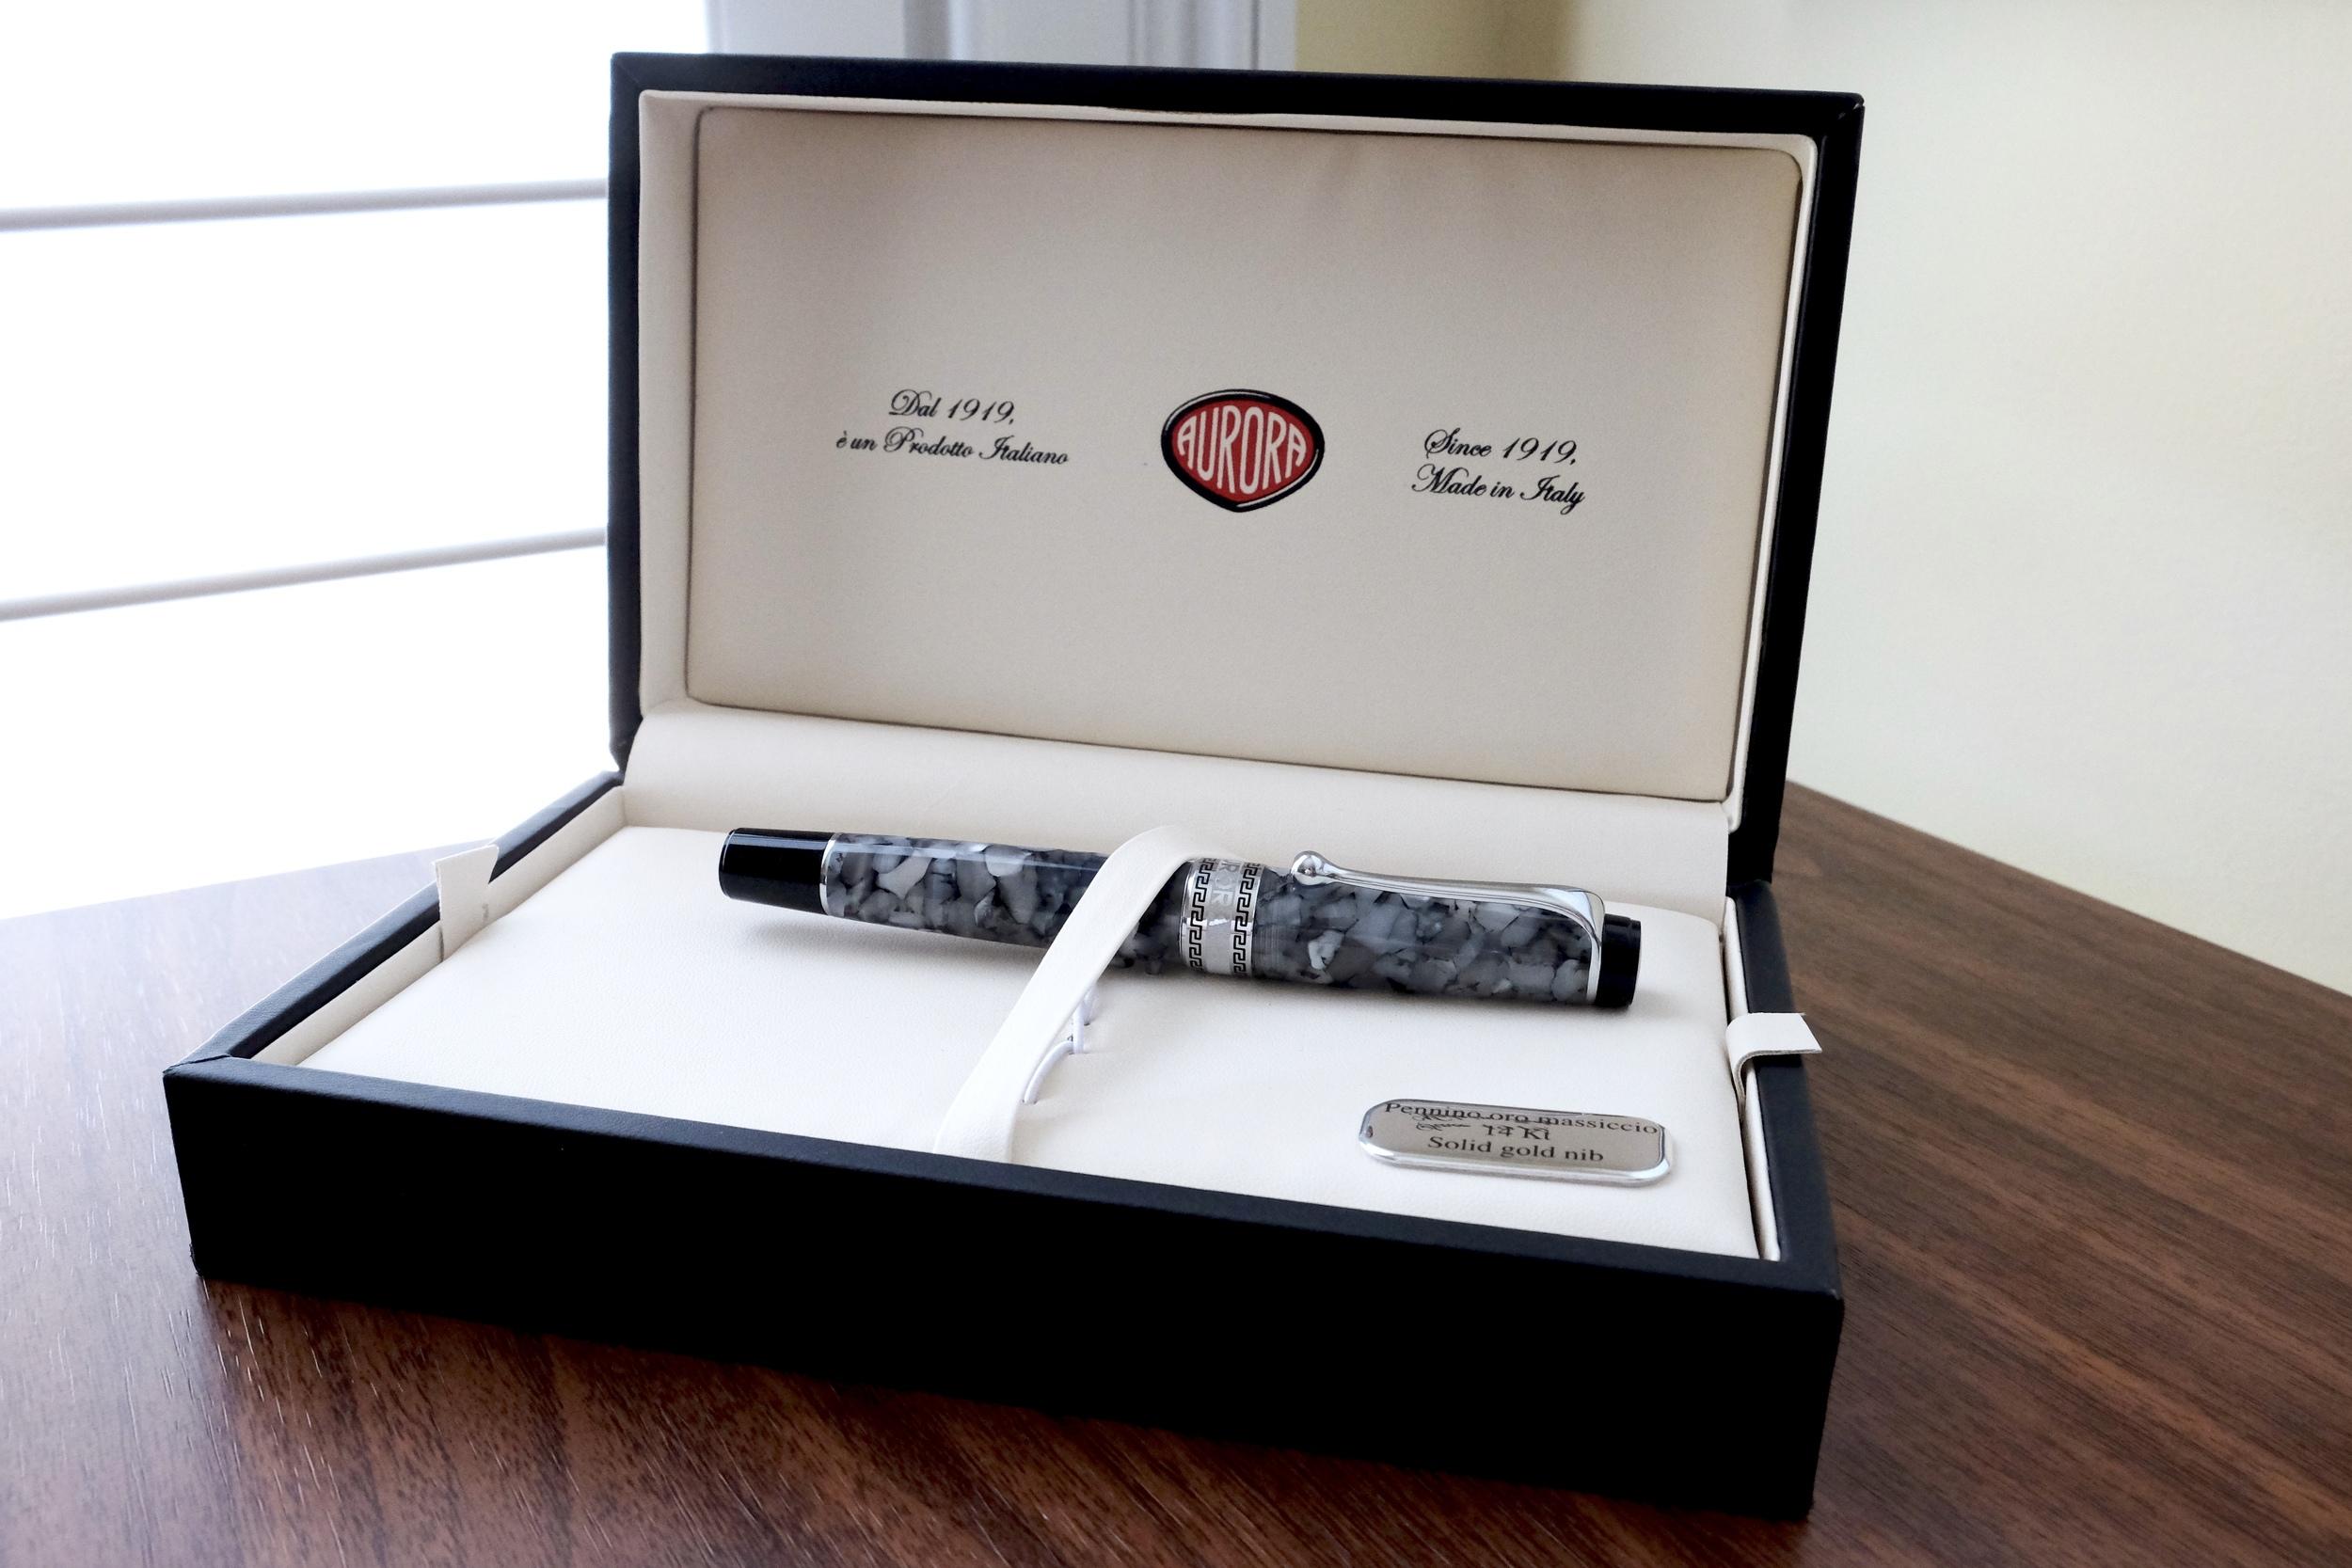 The Aurora Optima Nero Perla, in Aurora's simple, yet gorgeous, presentation box. The Italian pen companies always seem to do packaging well.